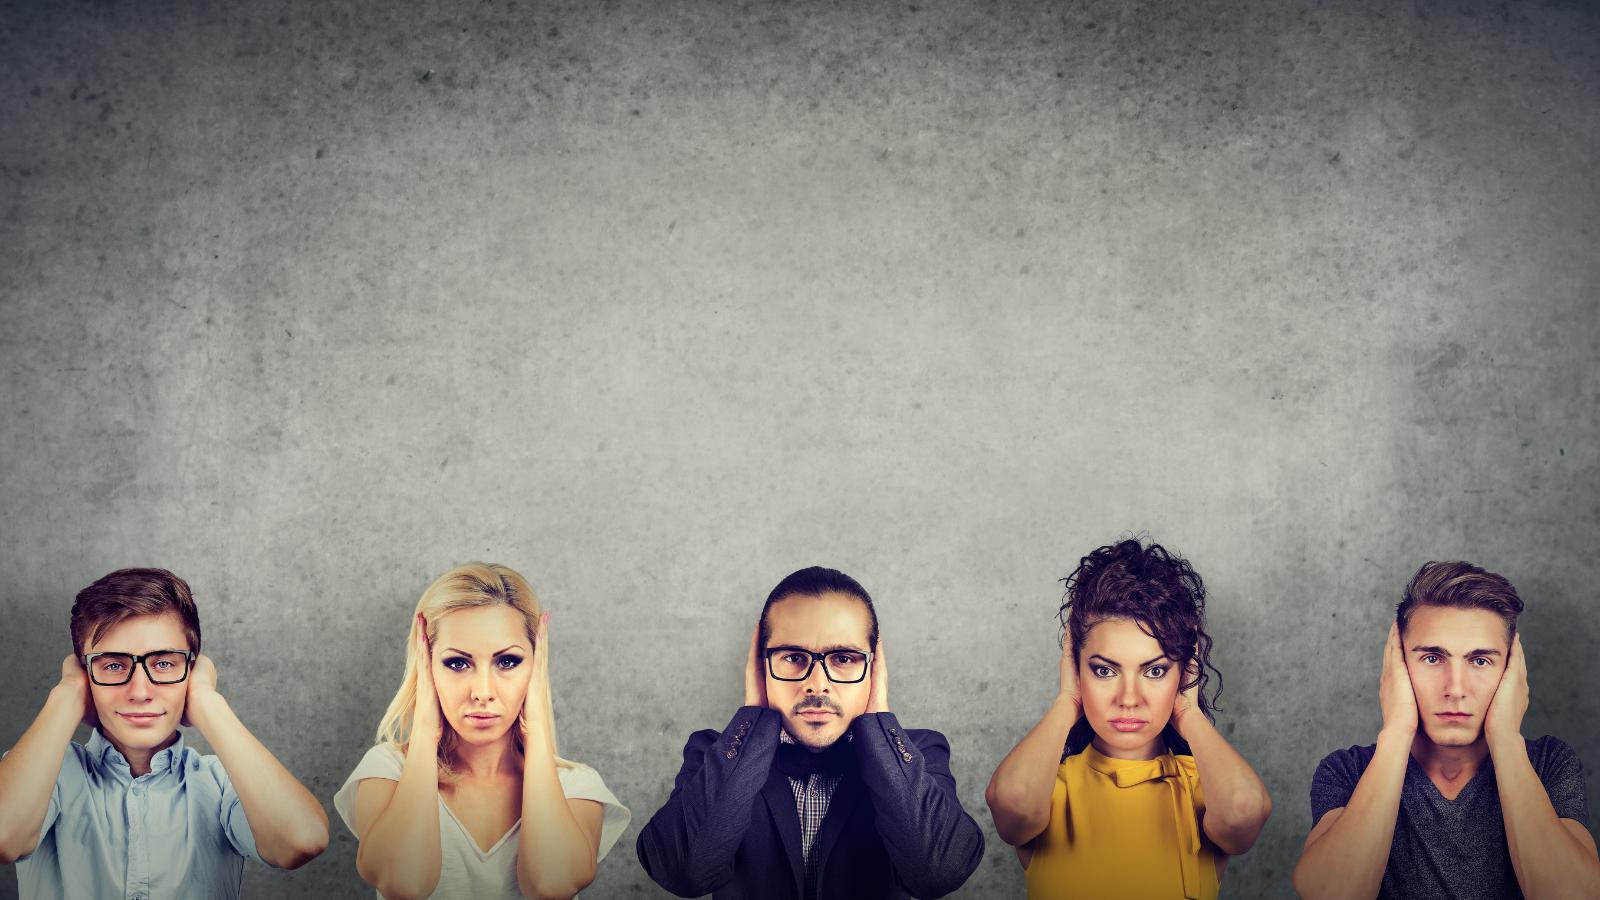 Overcoming Common Workplace Miscommunication